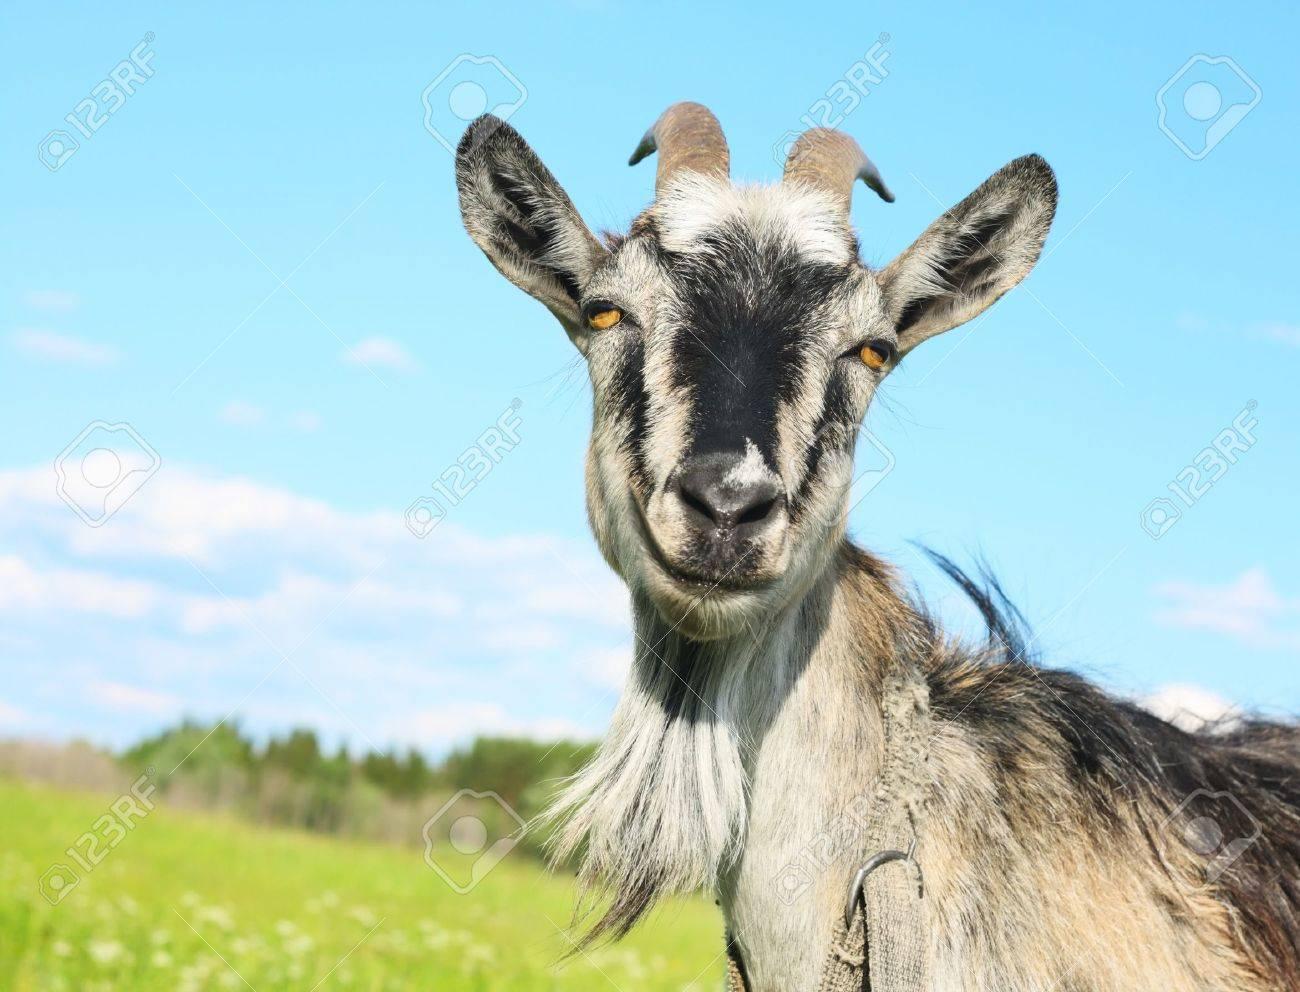 Smiling goat over blue sky - 7297228